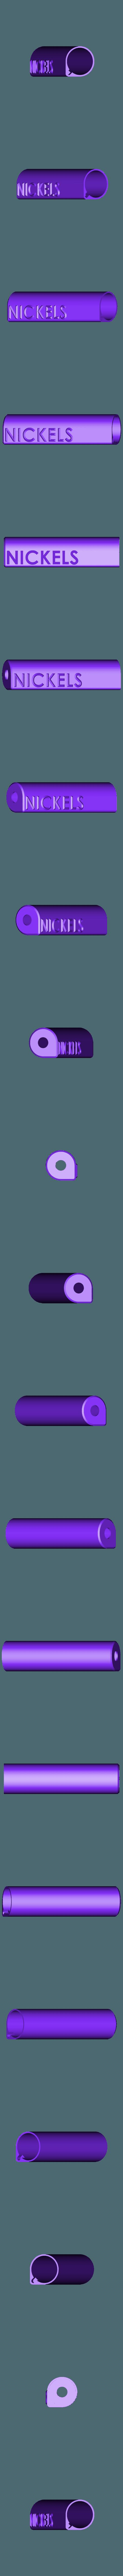 Nickel Roll.stl Download free STL file Coin Rolls • Design to 3D print, Hom3d